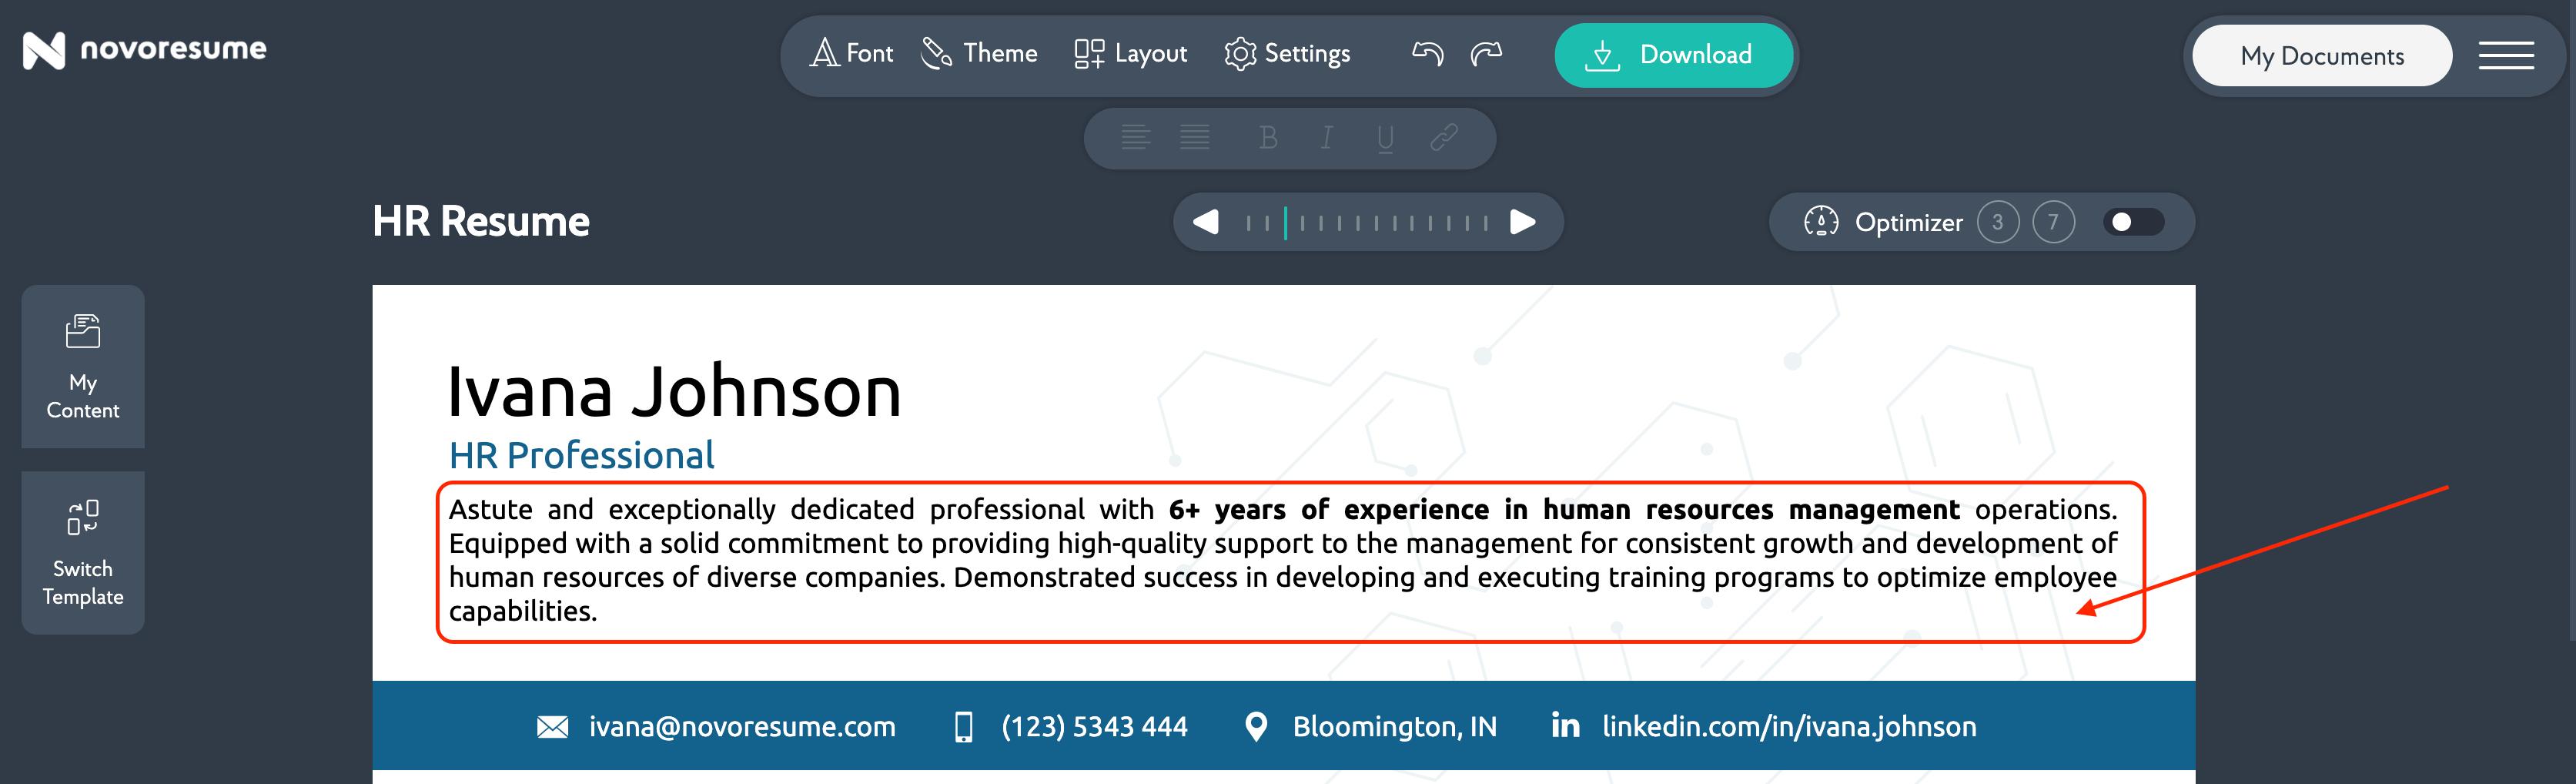 resume summary for hr resume